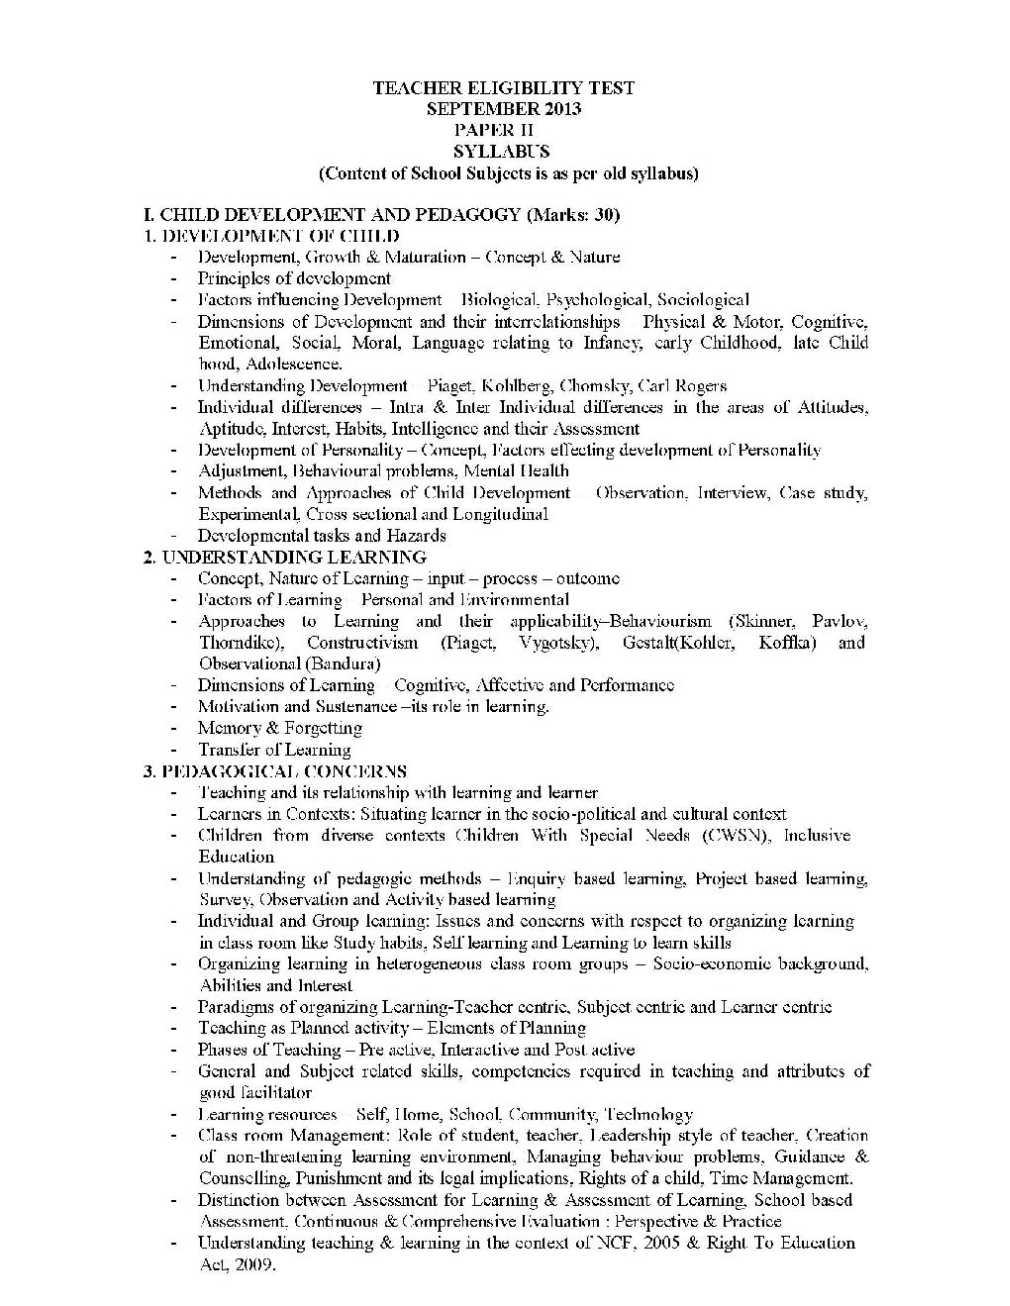 TET material in Hindi - 2019-2020 StudyChaCha